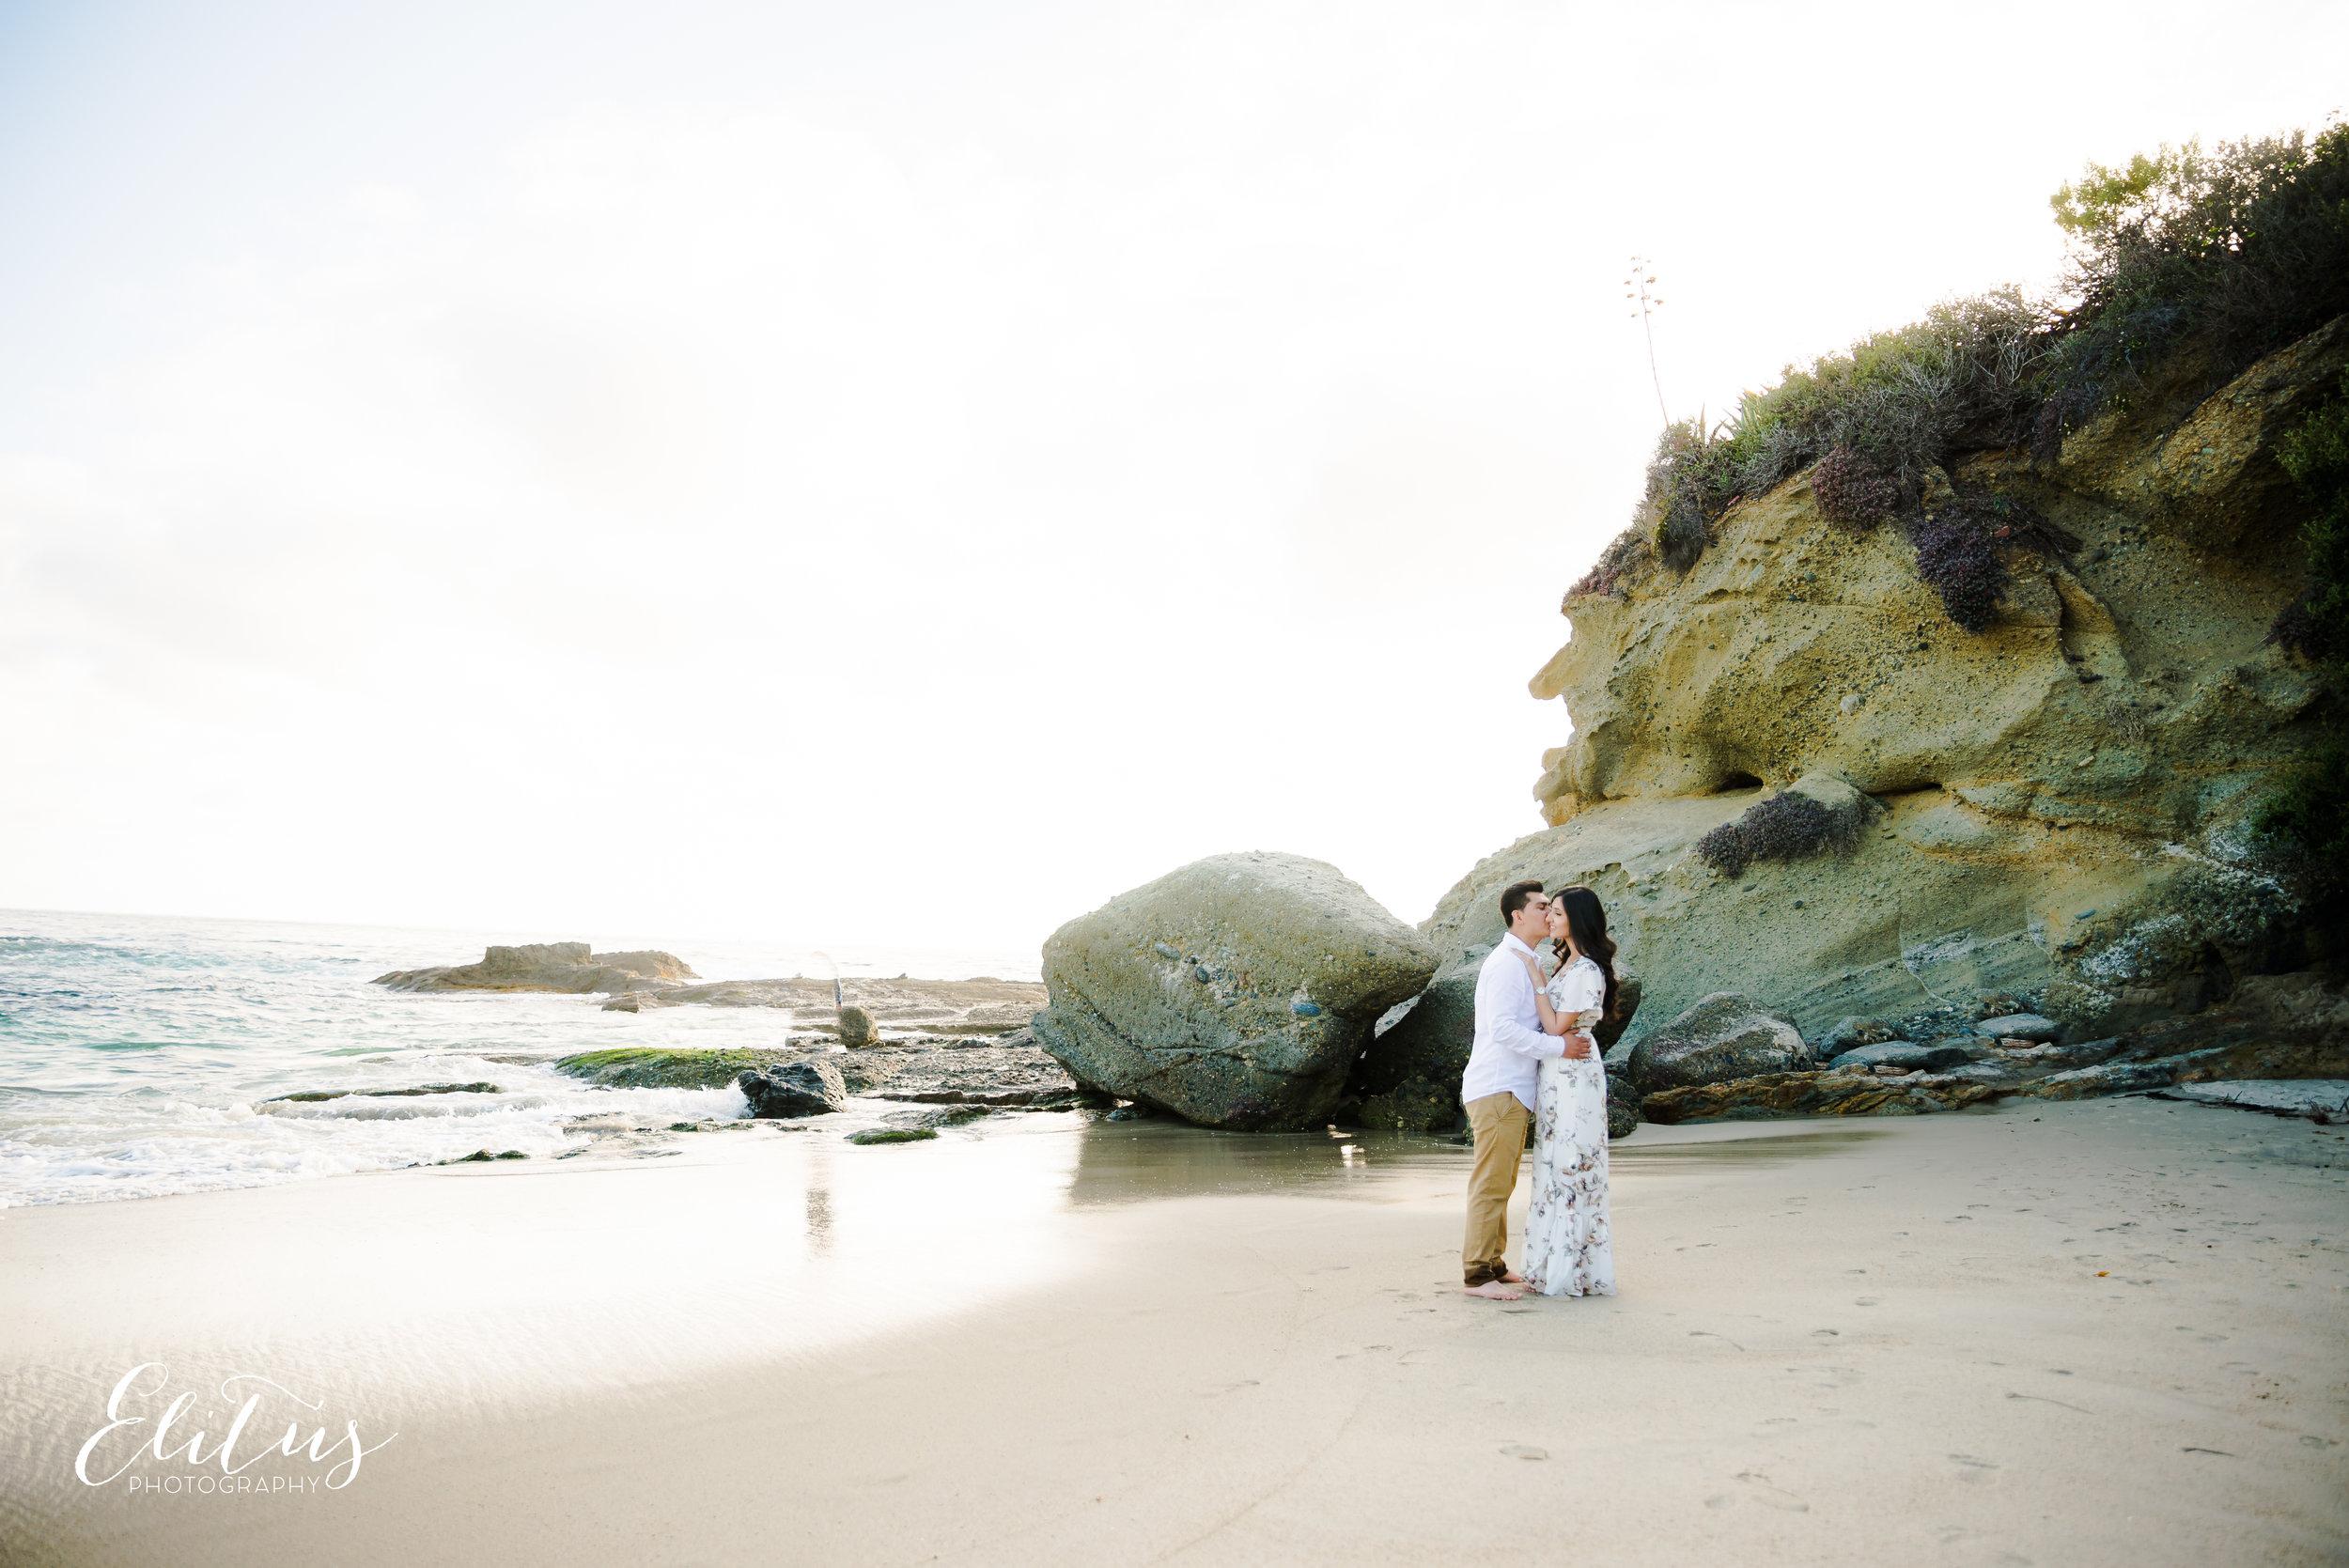 elitus-photograpy-laguna-beach-marisol-benito-engagement (51 of 115).jpg